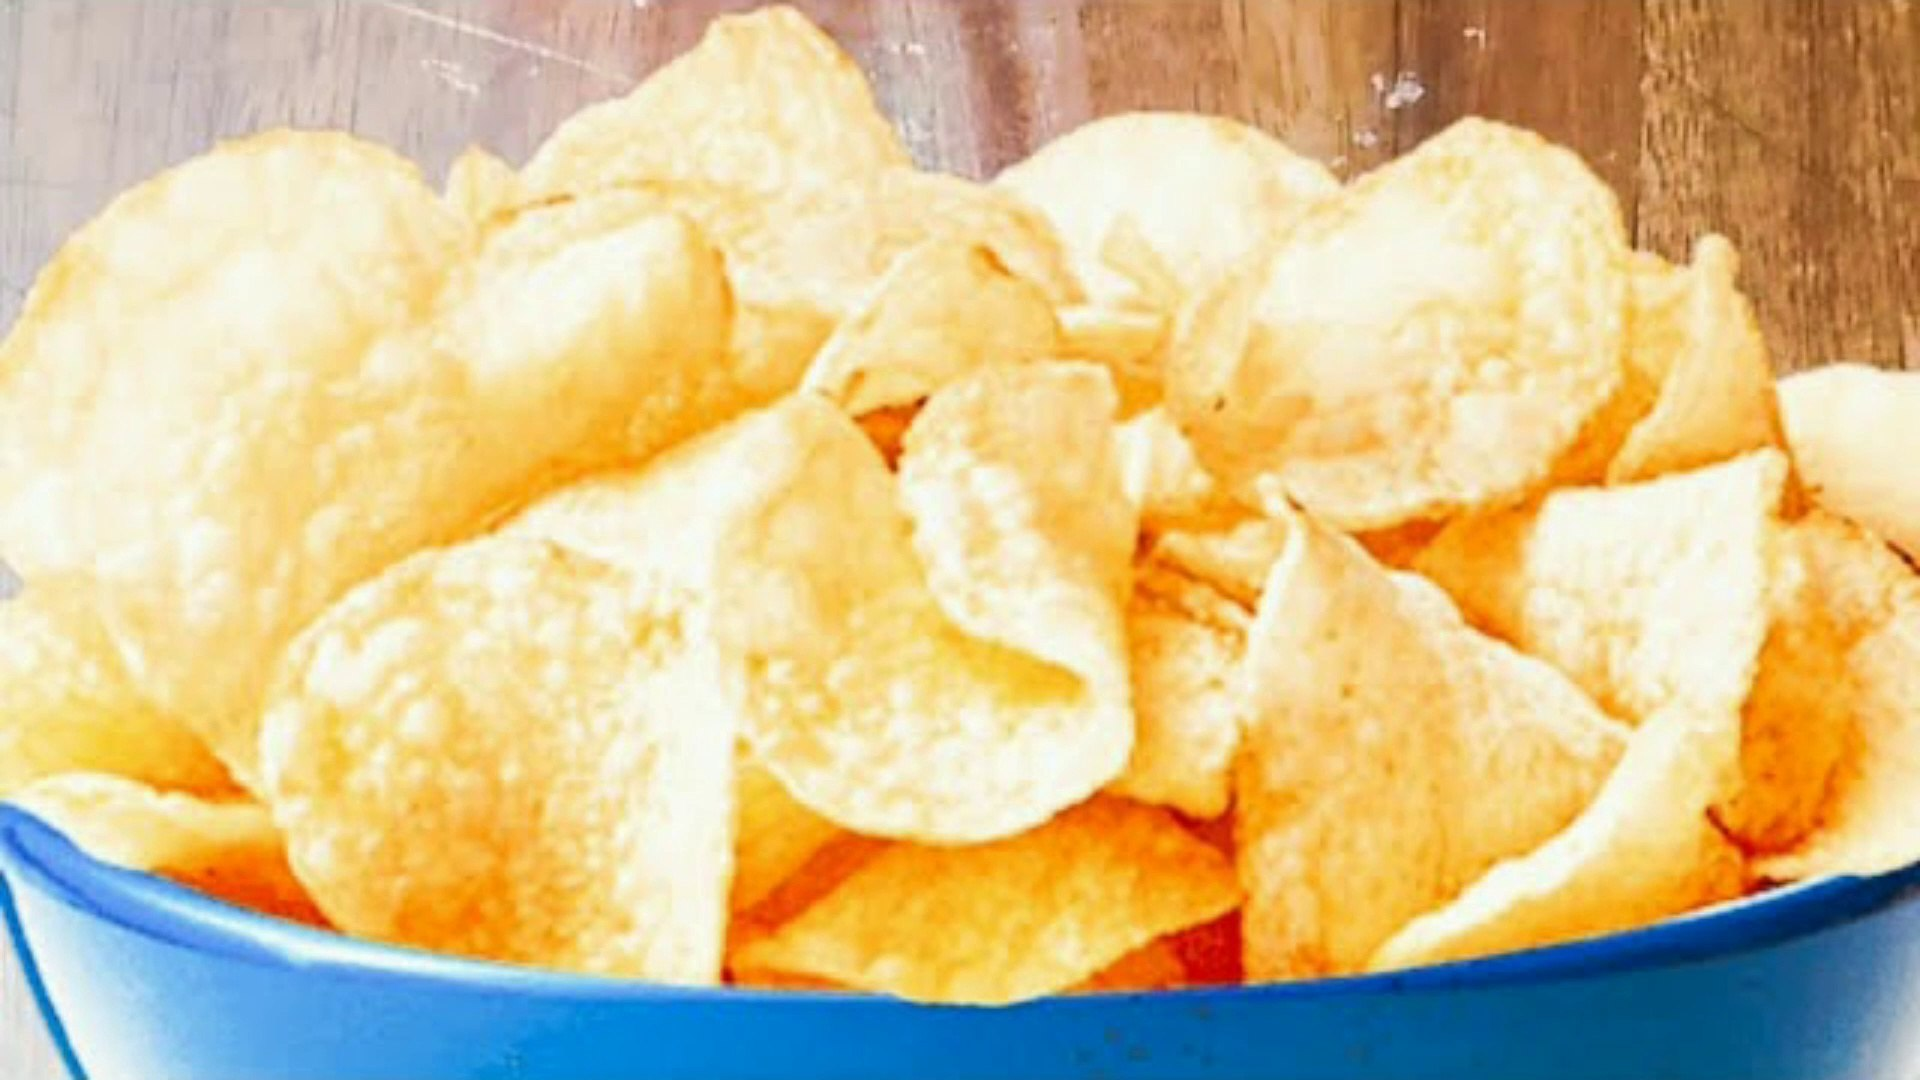 potato chips recipe - homemade chips recipe